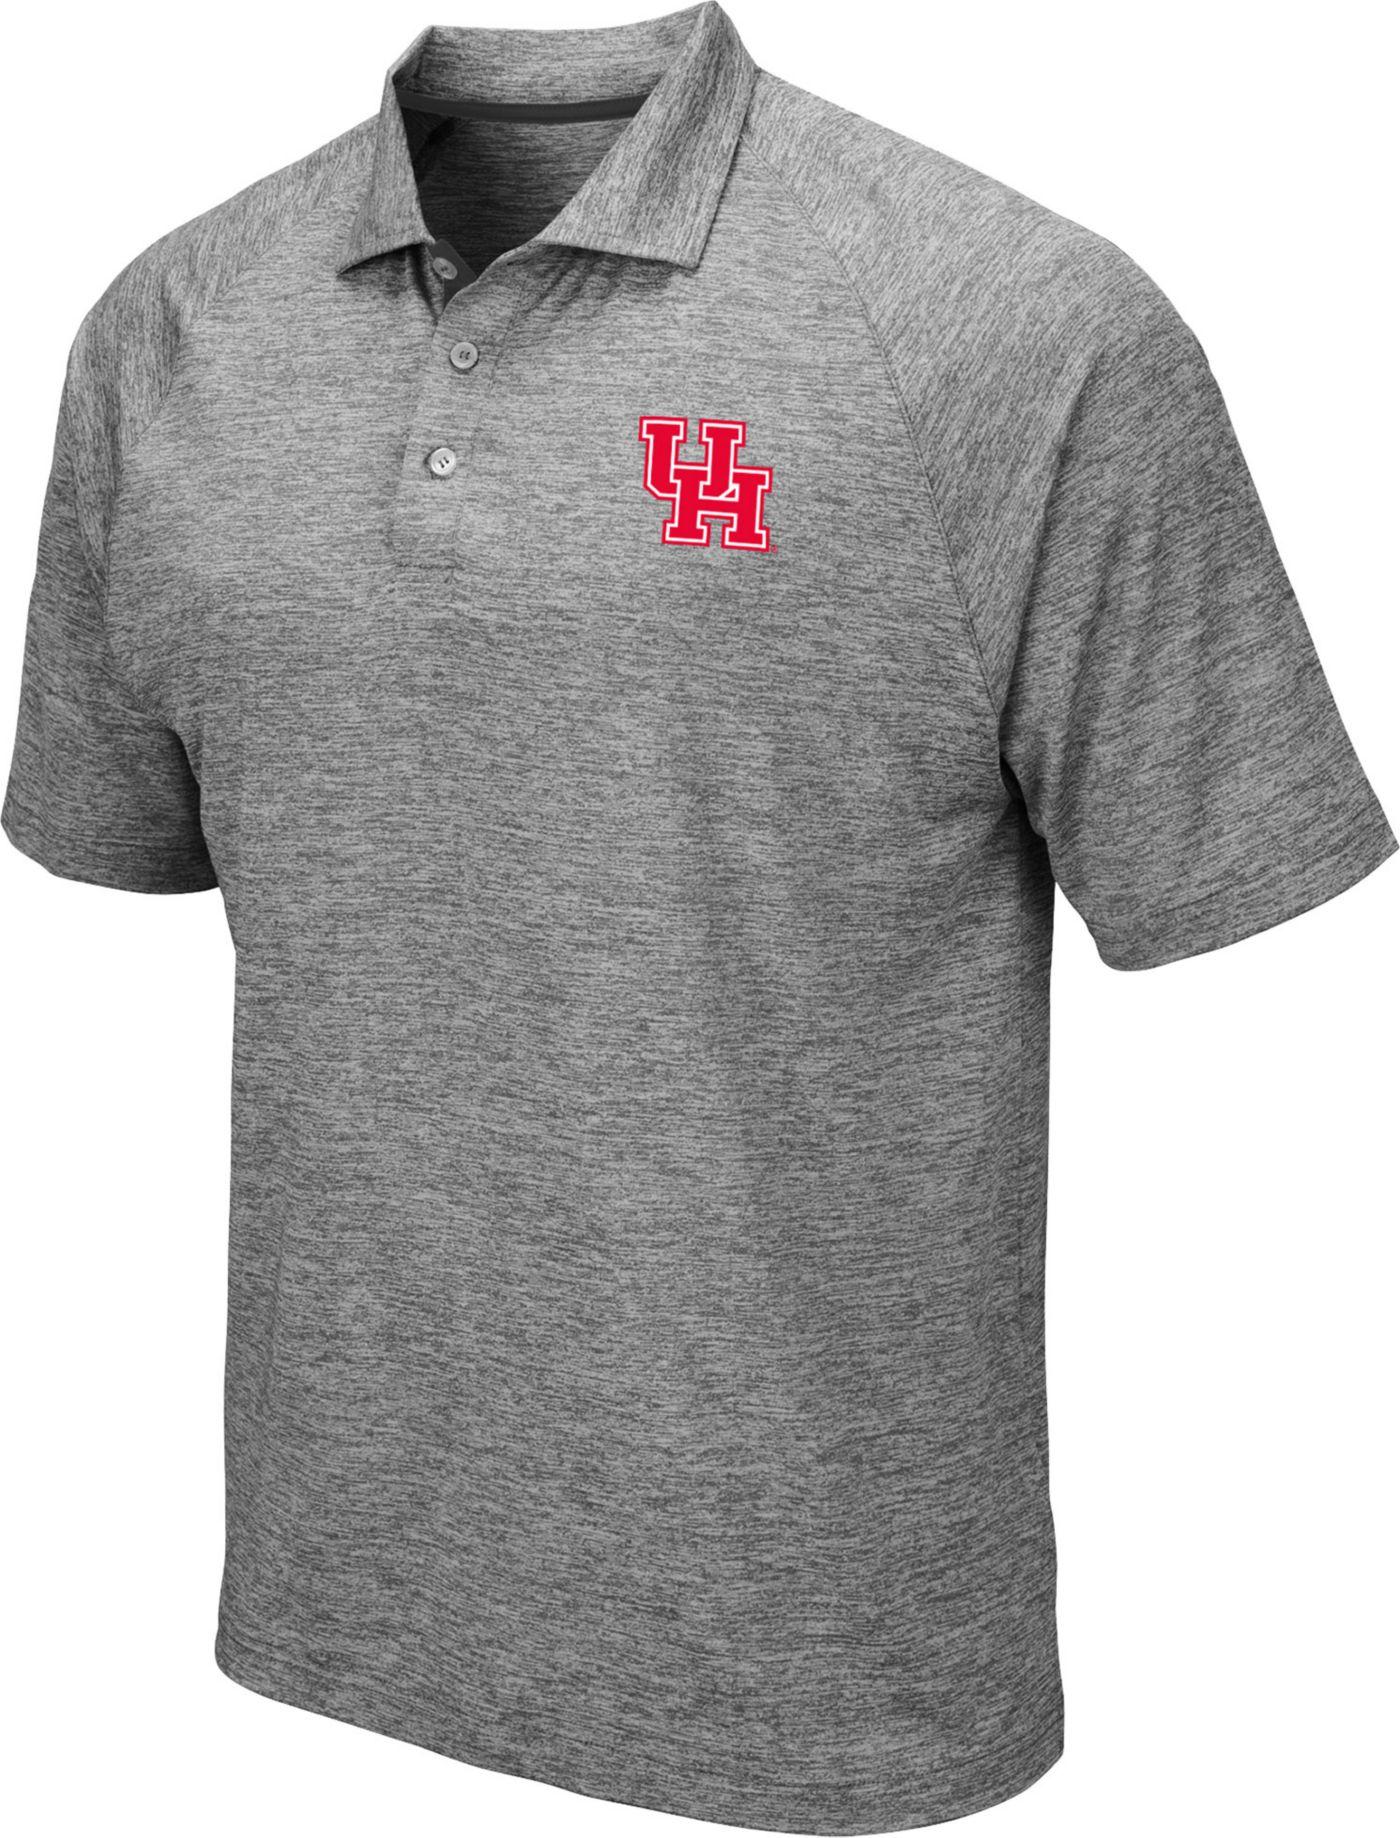 Colosseum Men's Houston Cougars Grey Chip Shot Polo